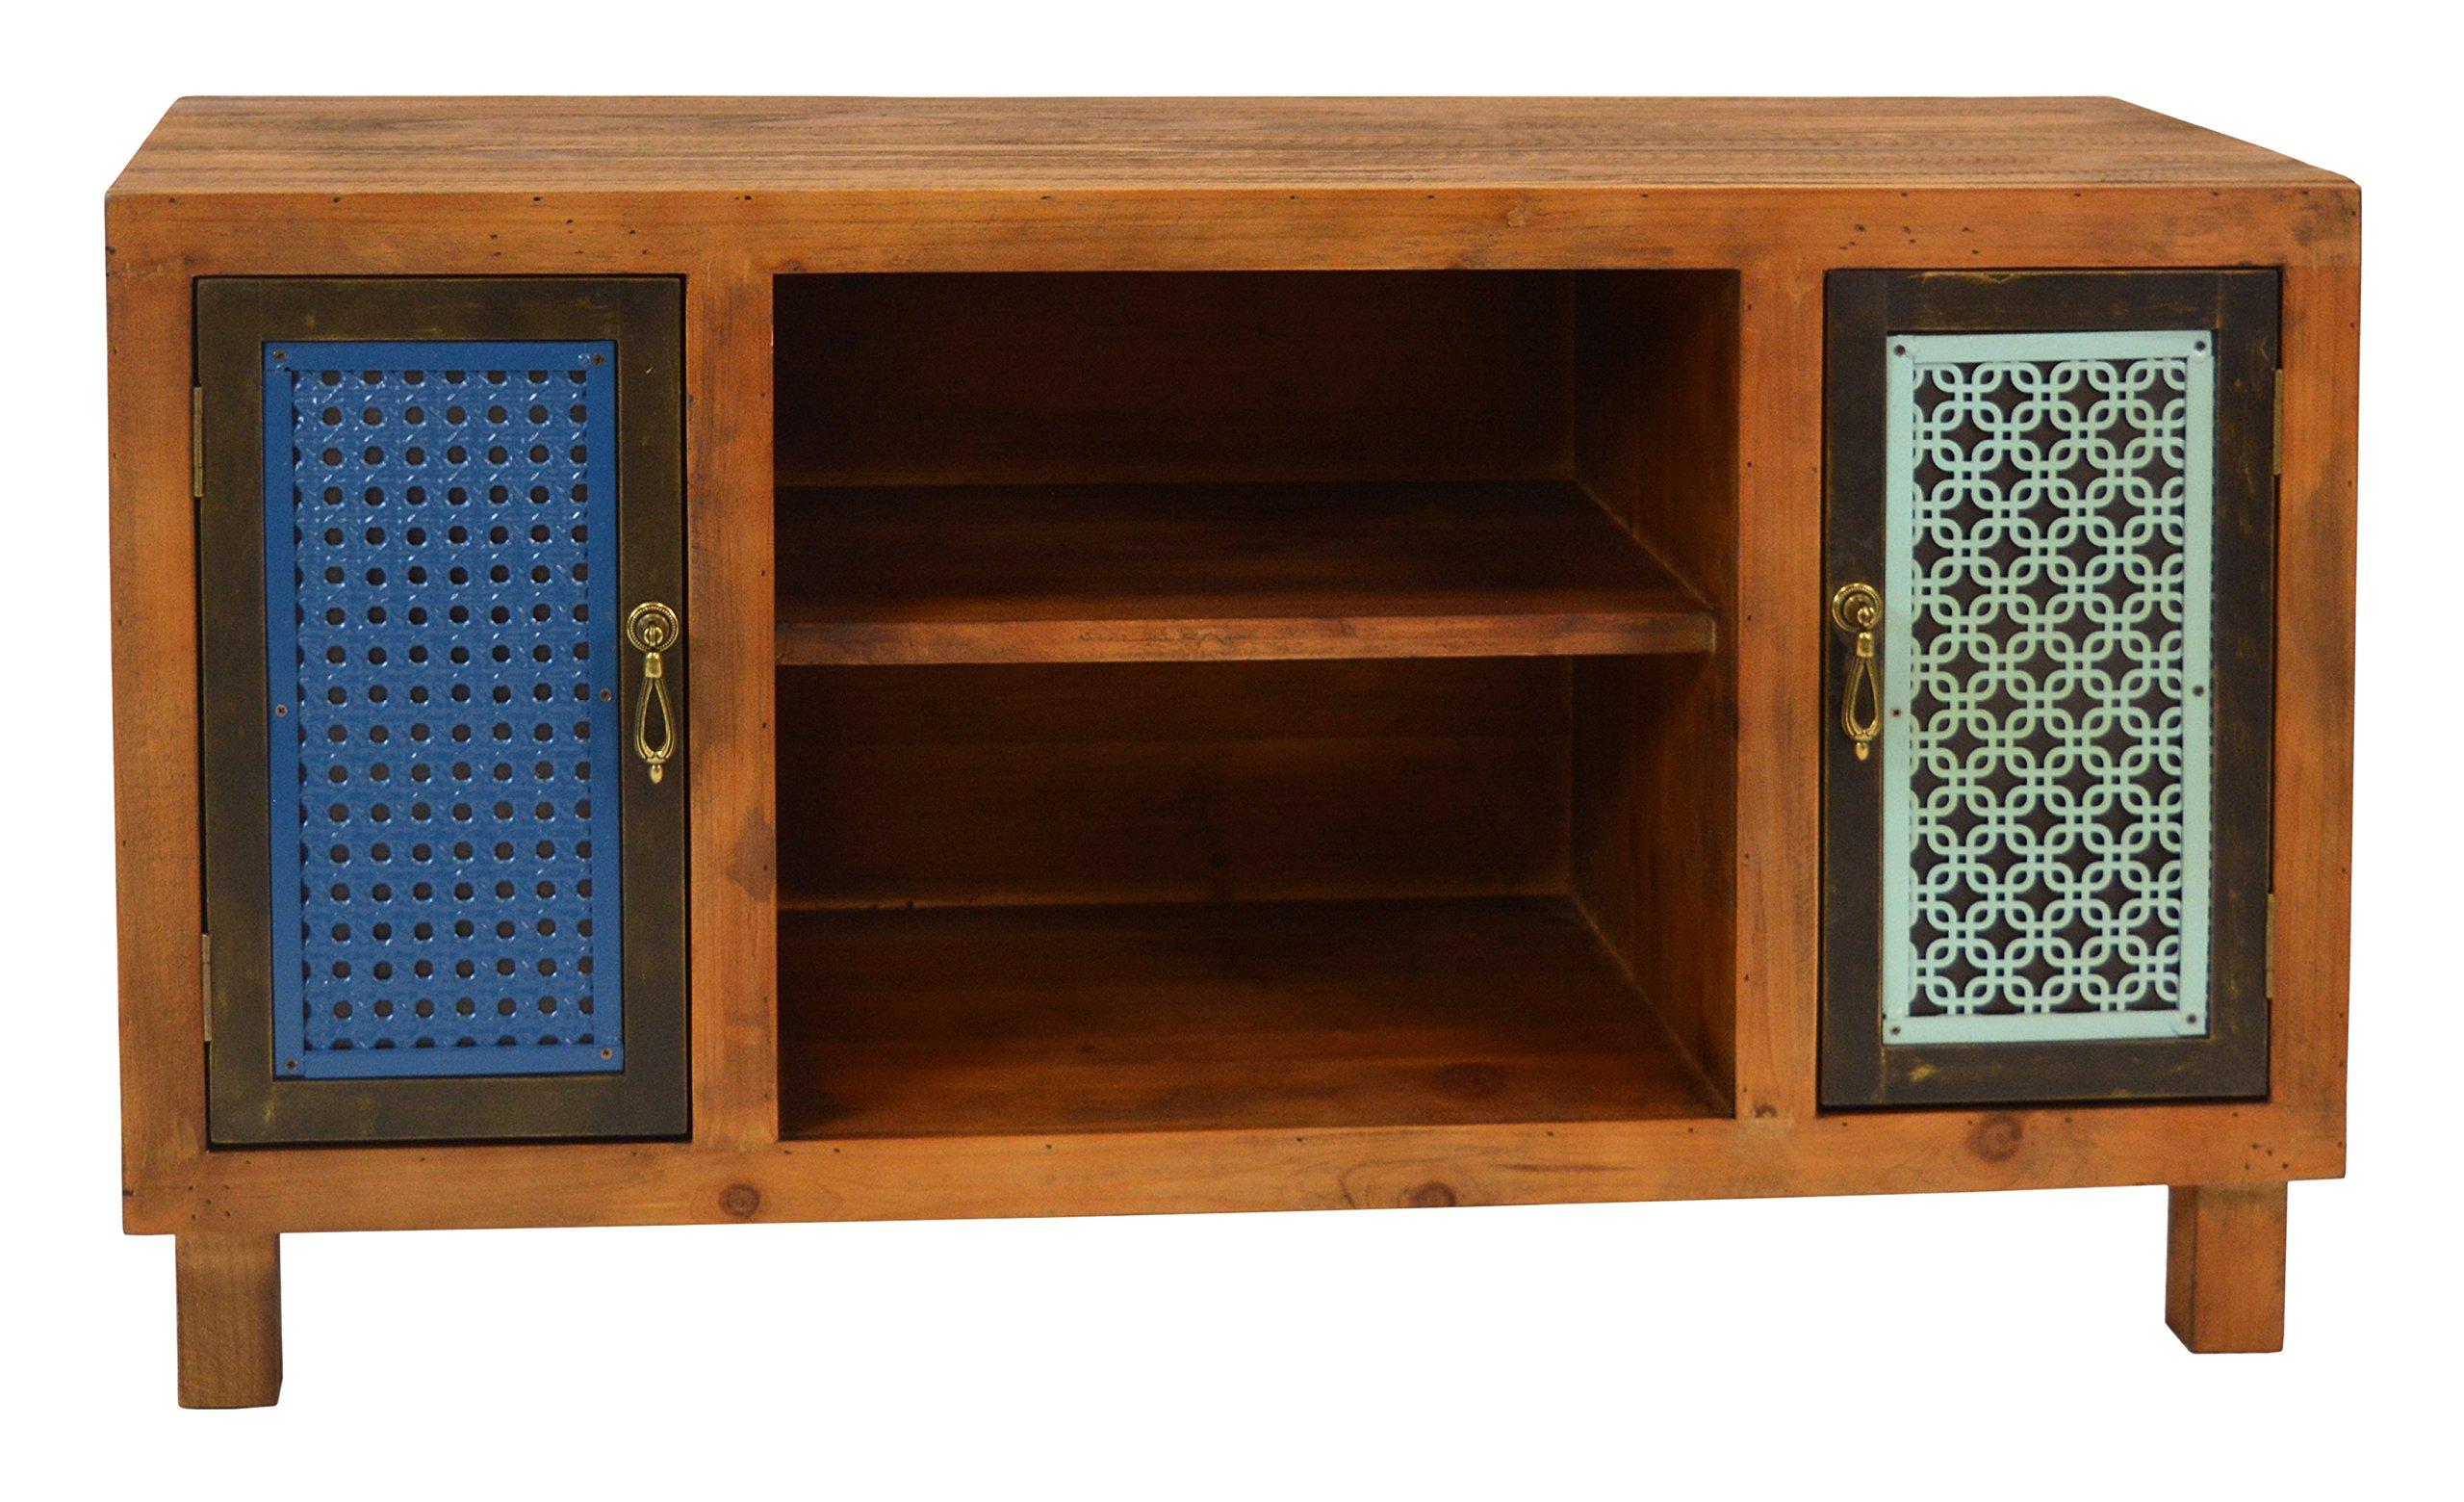 Großartig Hifi Regal Holz Foto Von Ts-ideen Tv-bank Lowboard Sideboard Kommode Hifi-schrank Flur